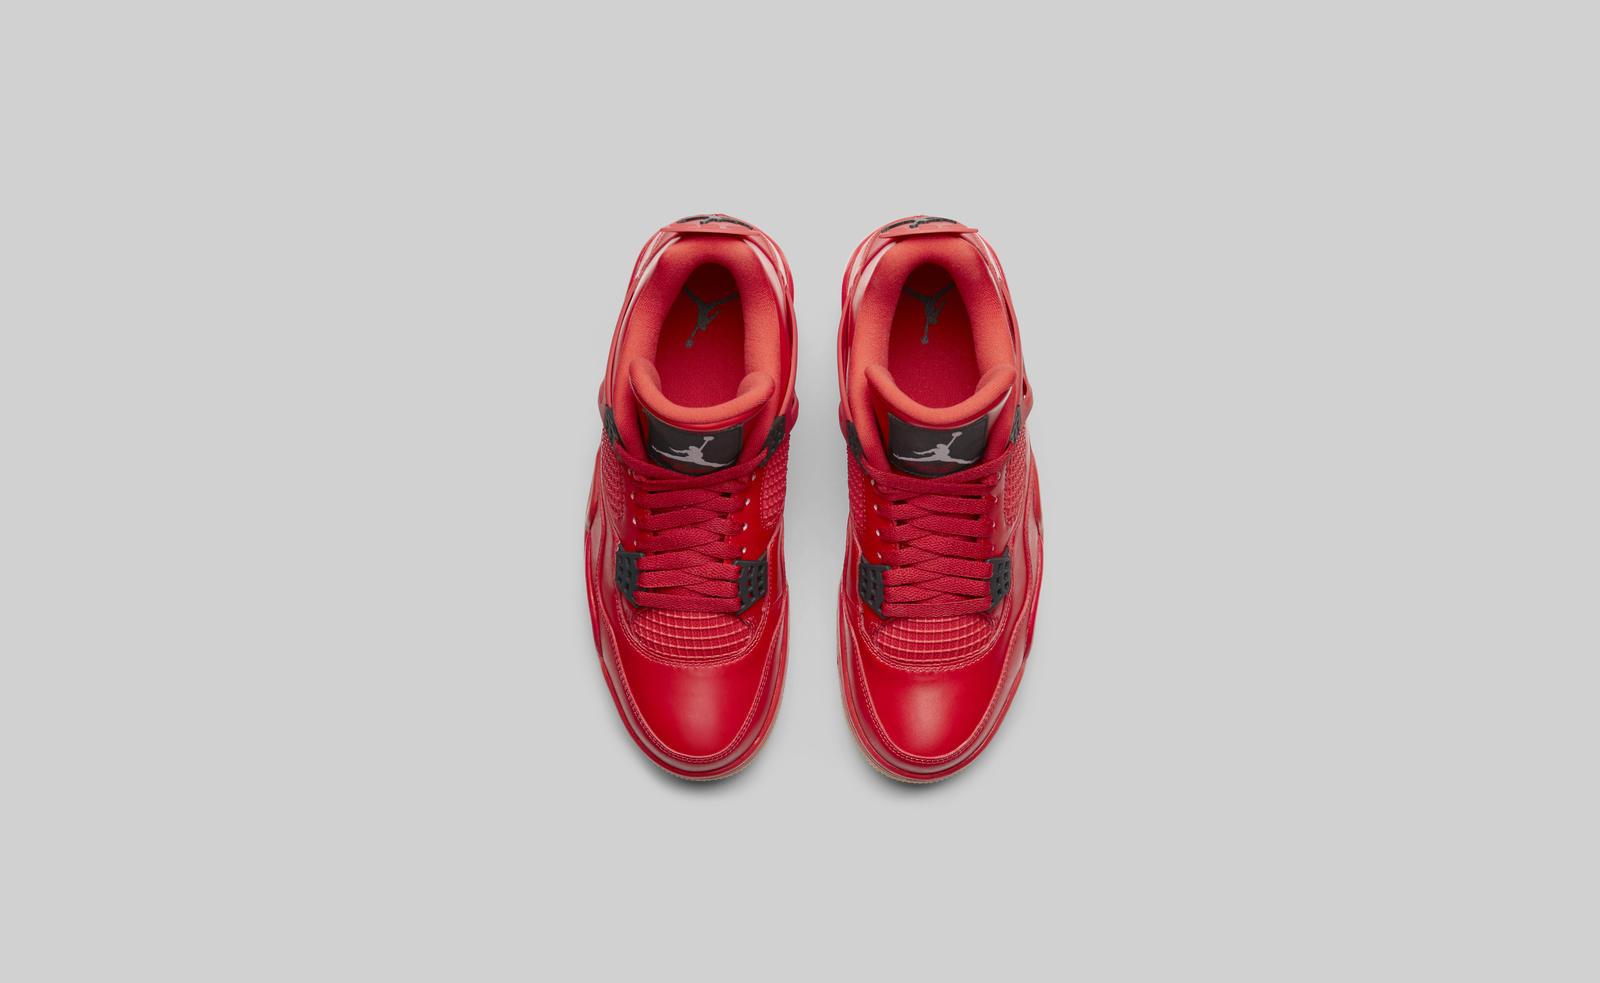 Air Jordan 4 fire red womens top